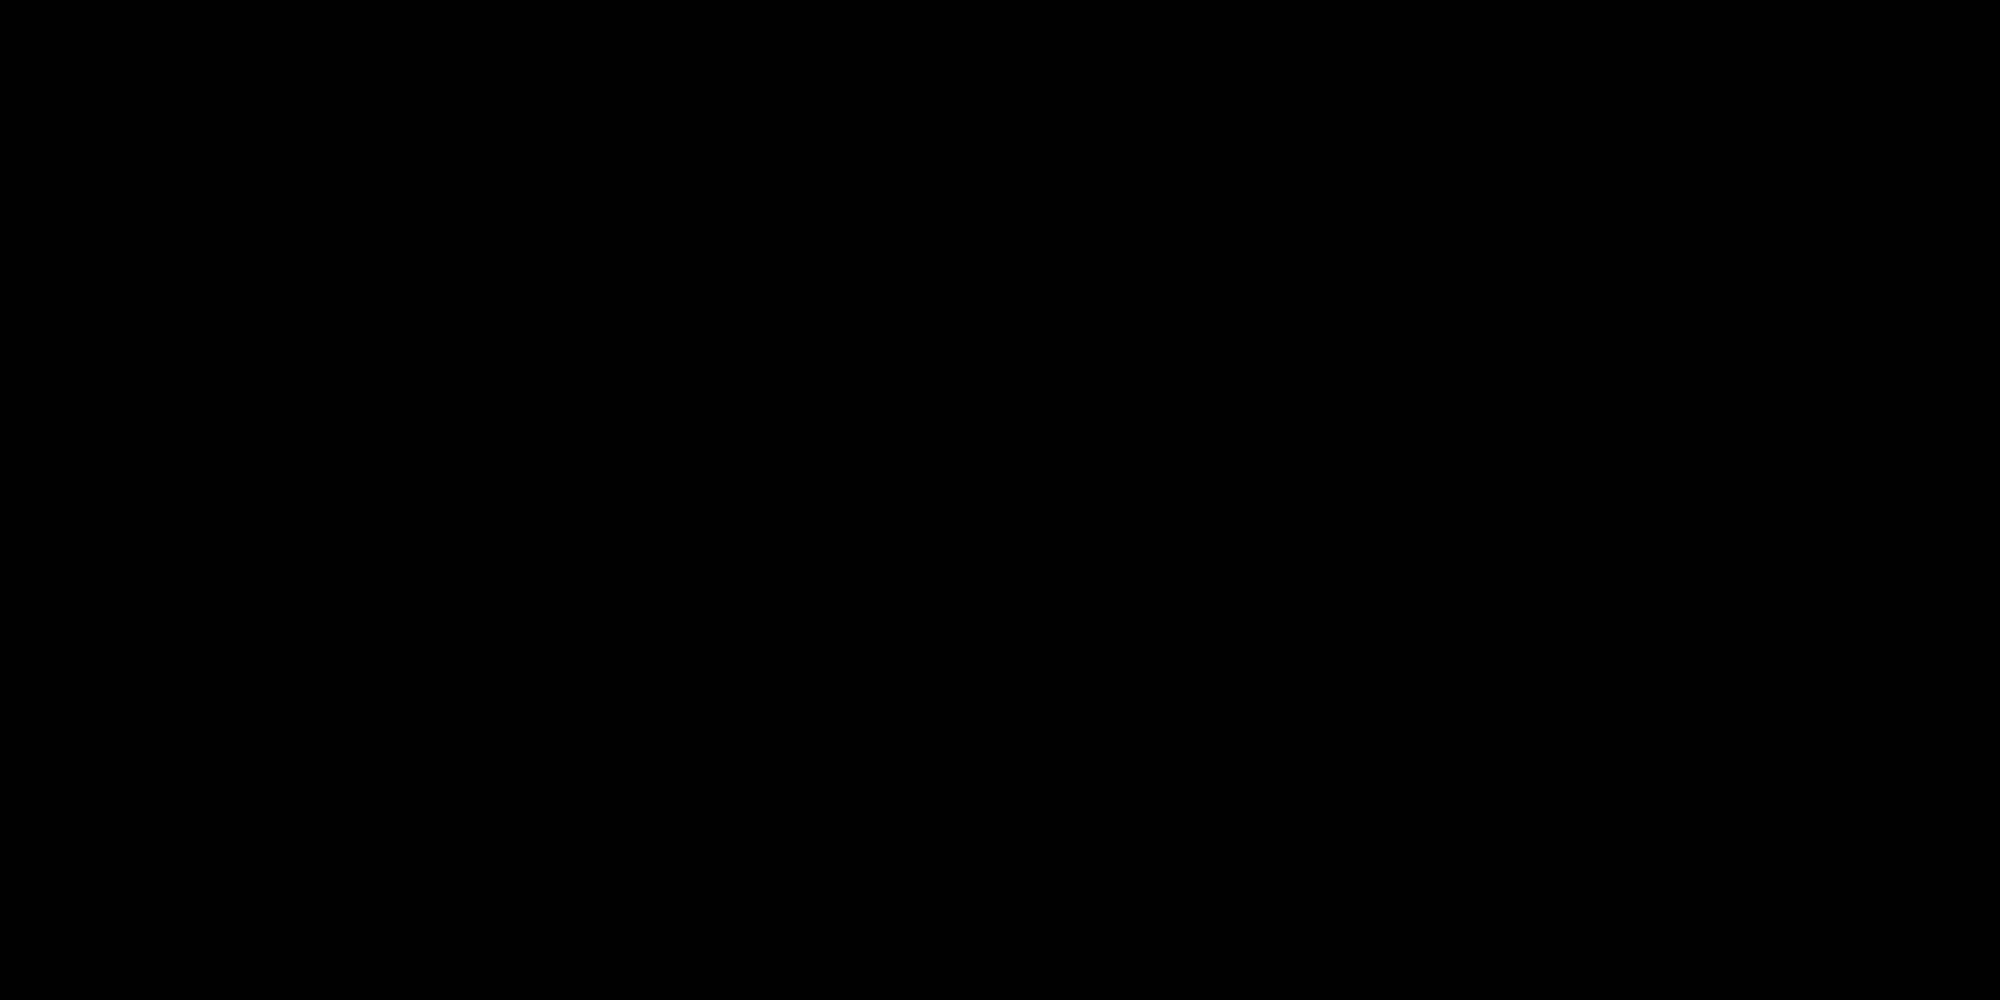 Panel Bottom 07